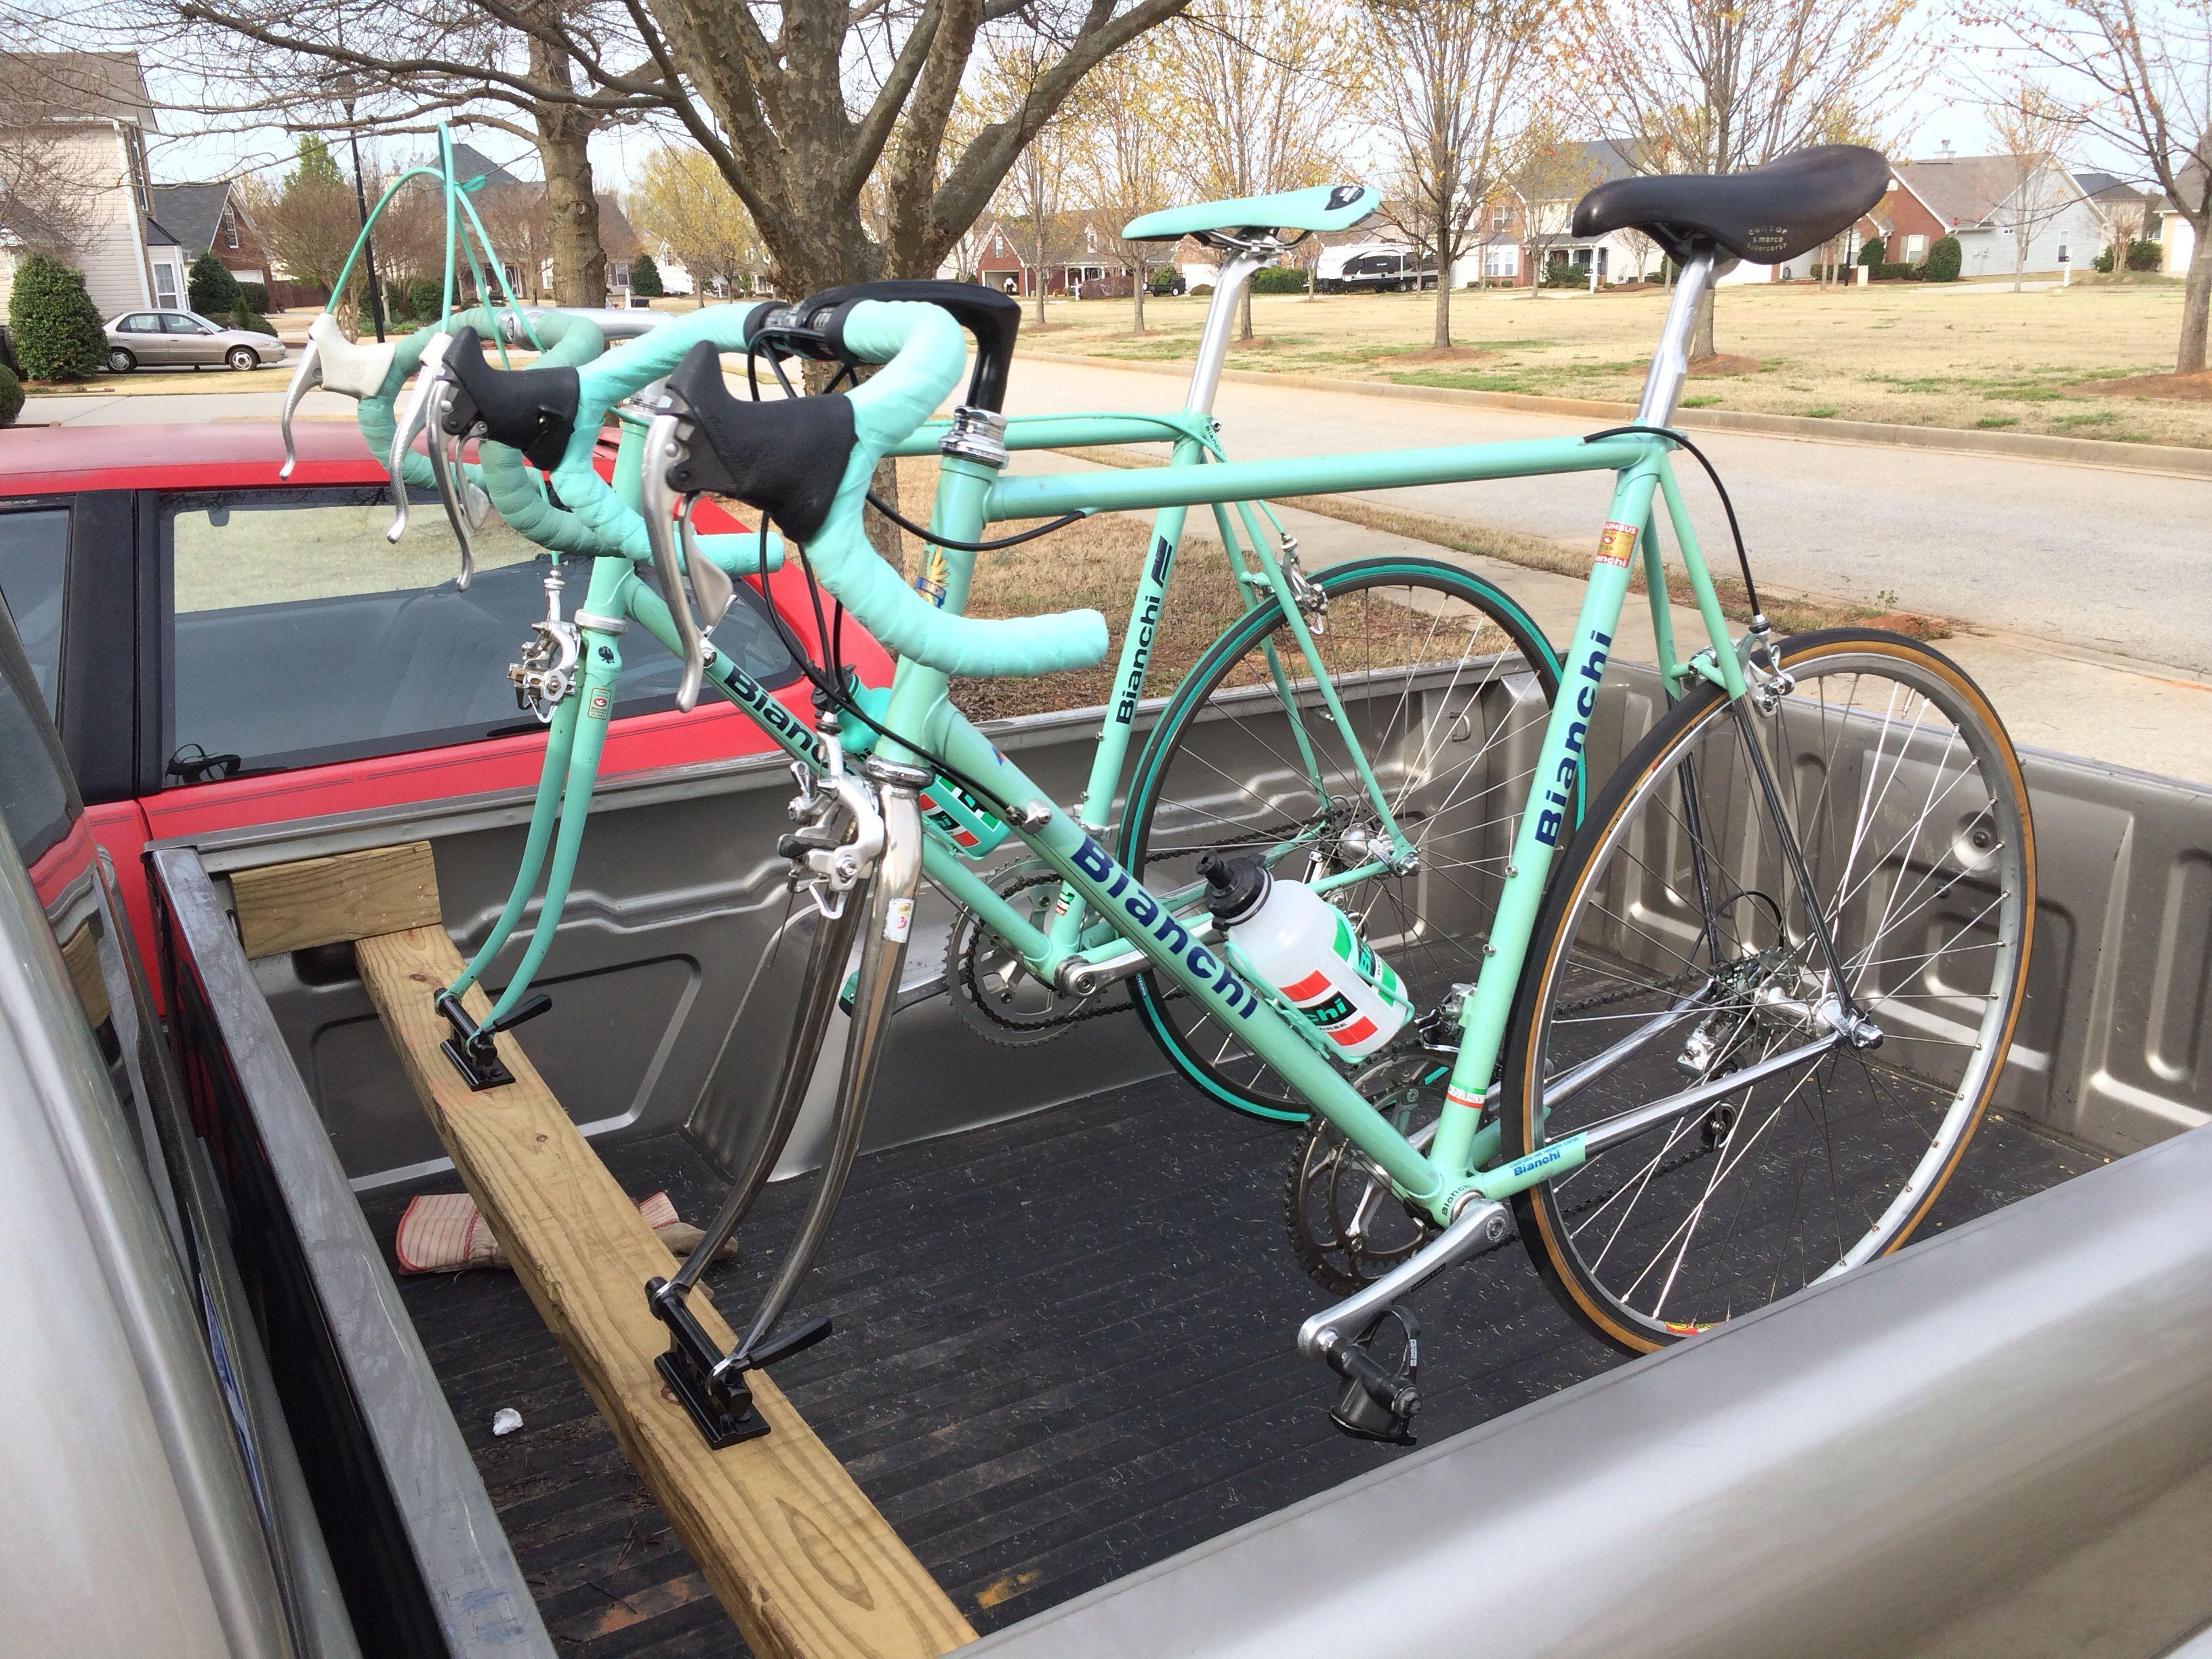 Truck Mount Bike Rack Cycling Pinterest Bicycling